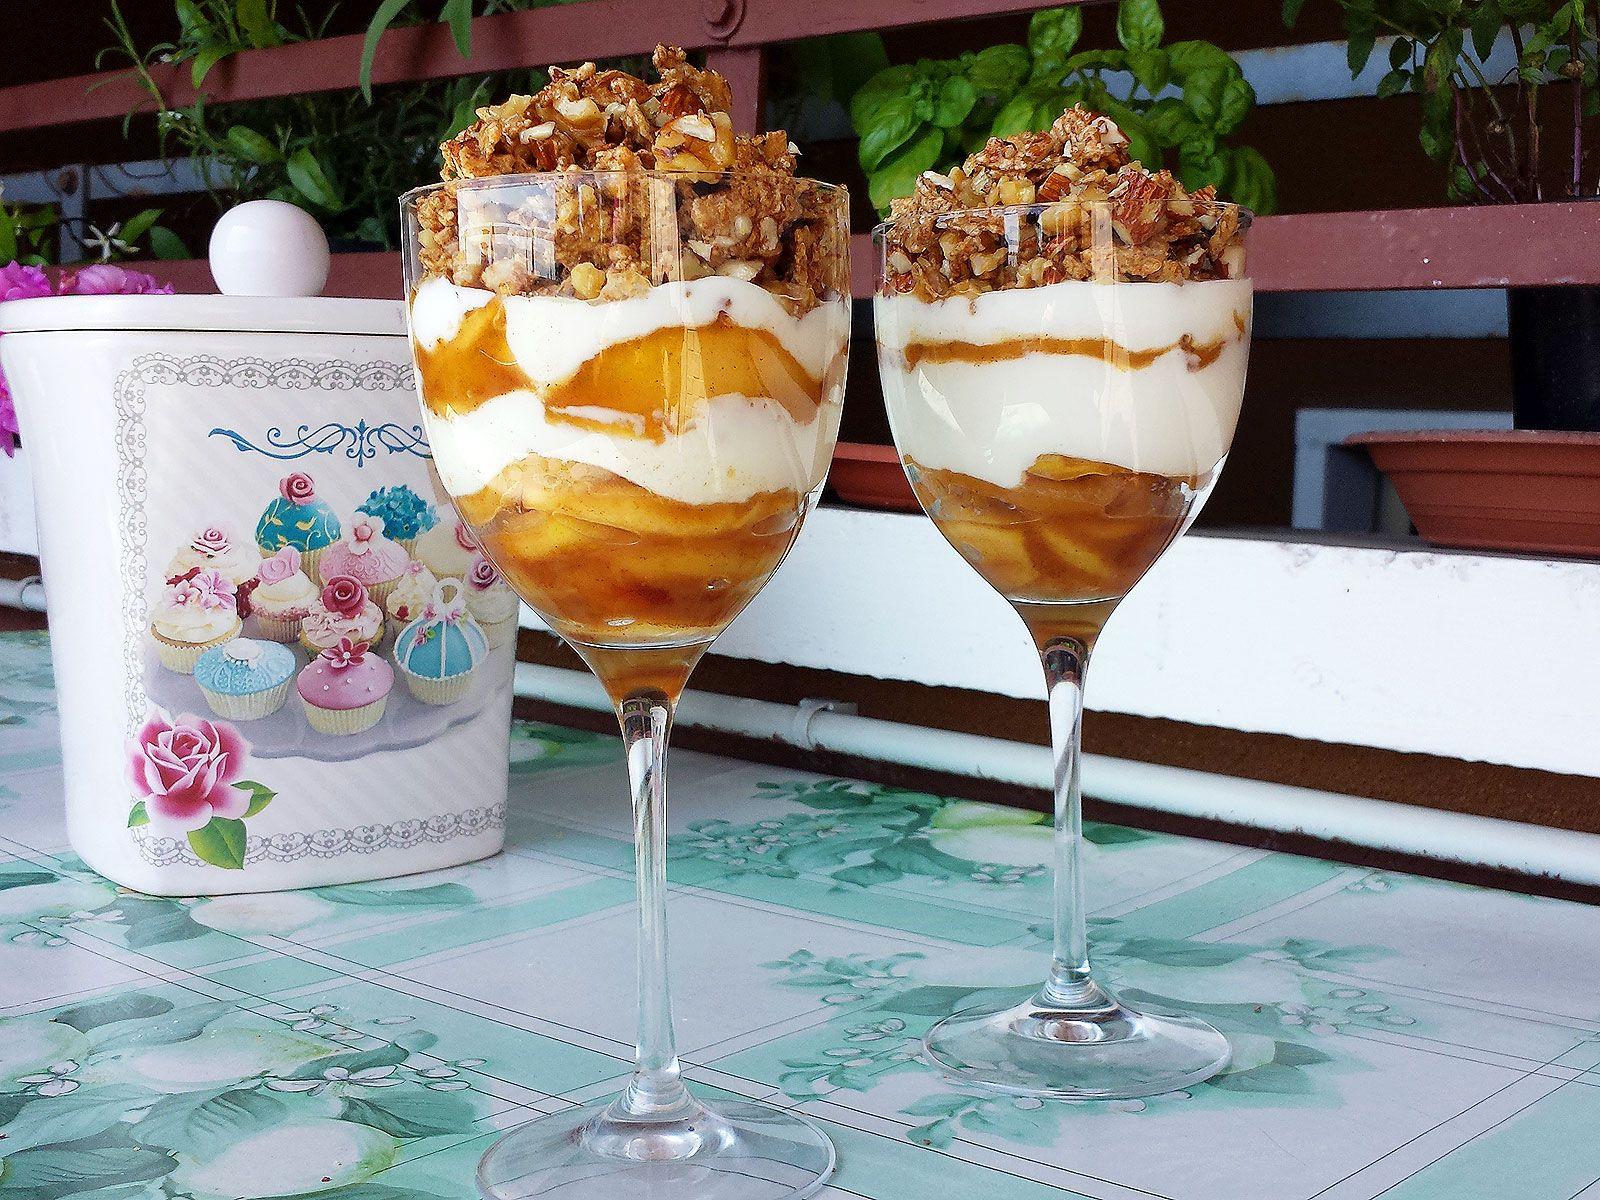 Pranzo Yogurt Magro : Un #dessert leggero composto da yogurt magro mele saltate e un